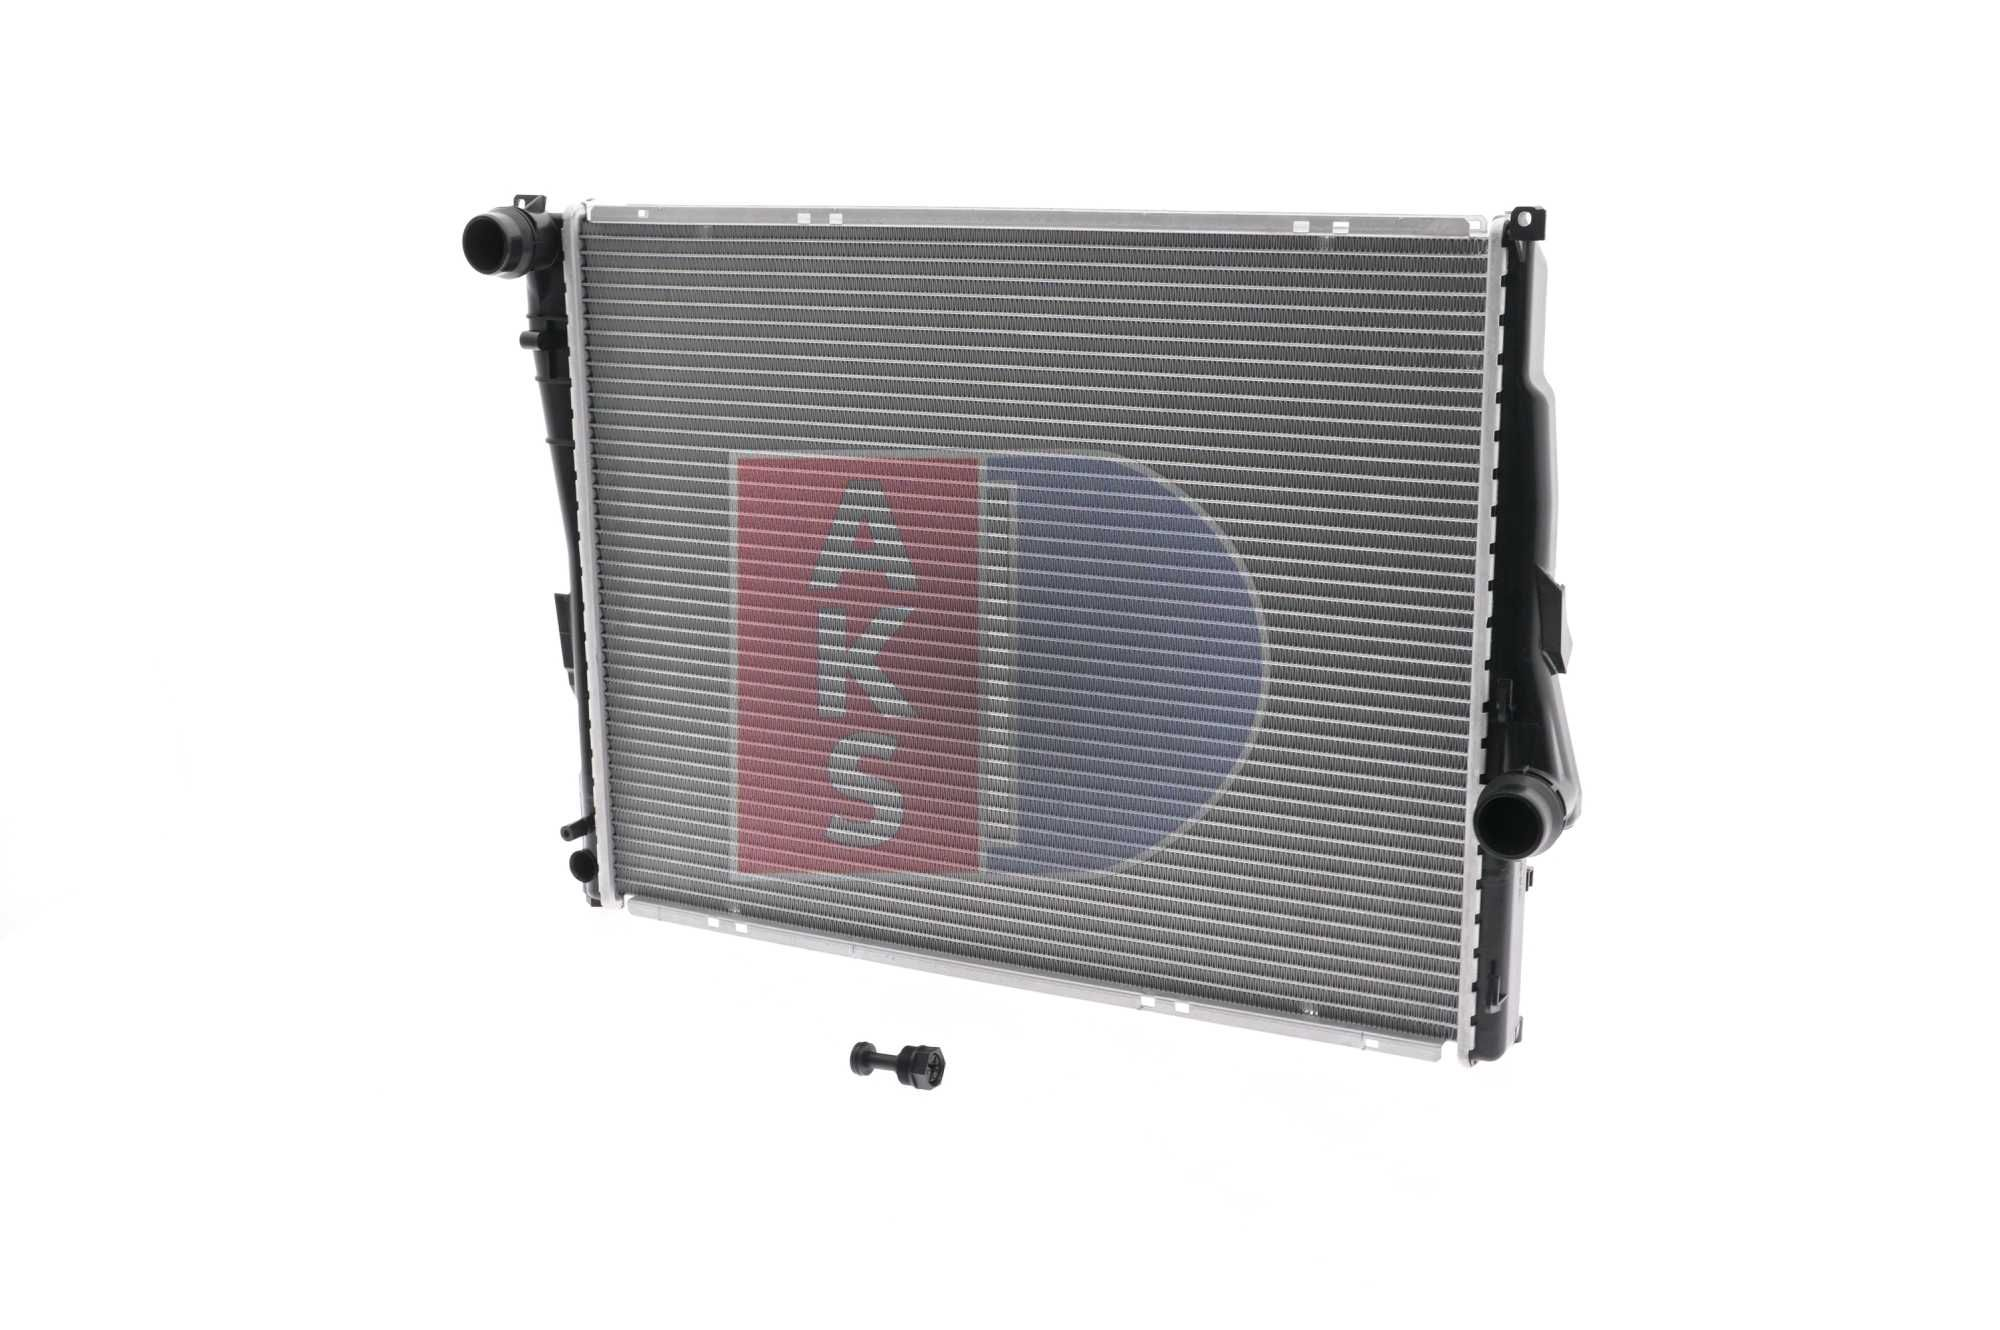 050004N Kühler AKS DASIS - Markenprodukte billig